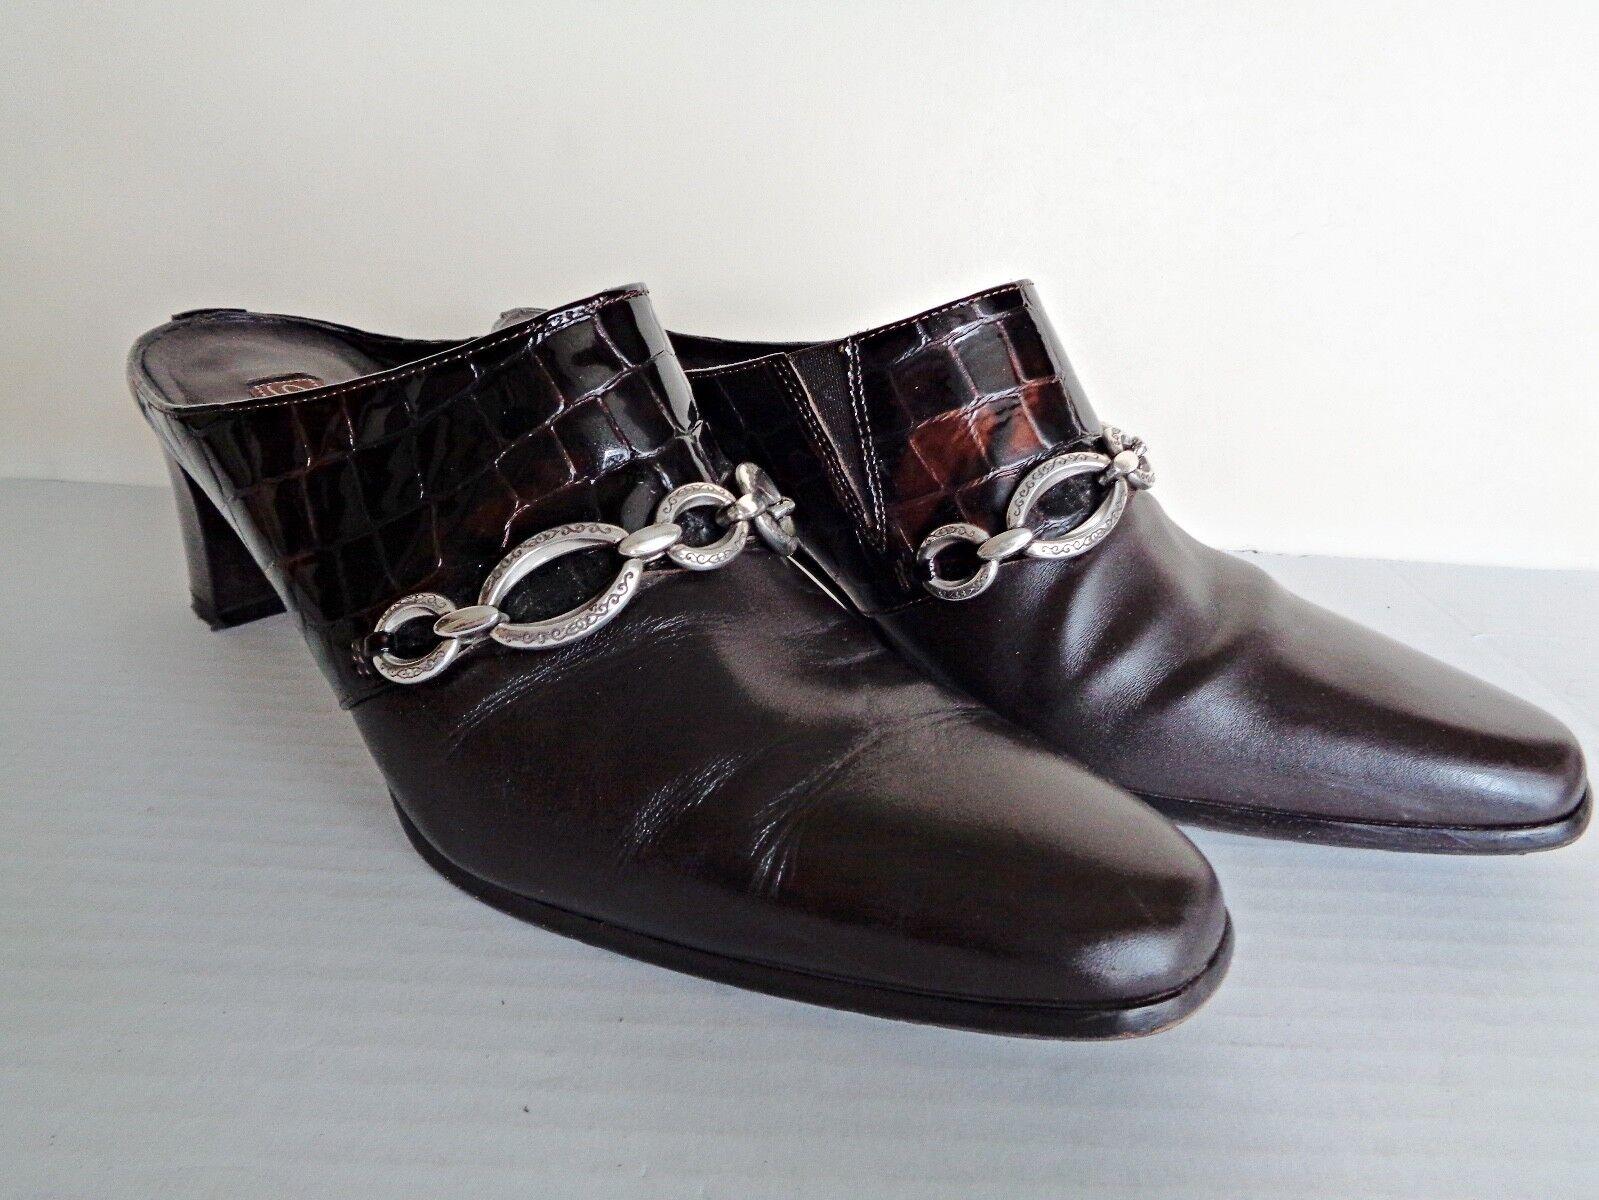 Brighton TWIGGY Chocolate Brown Croc Leather Mules Heels shoes 8N - EUC